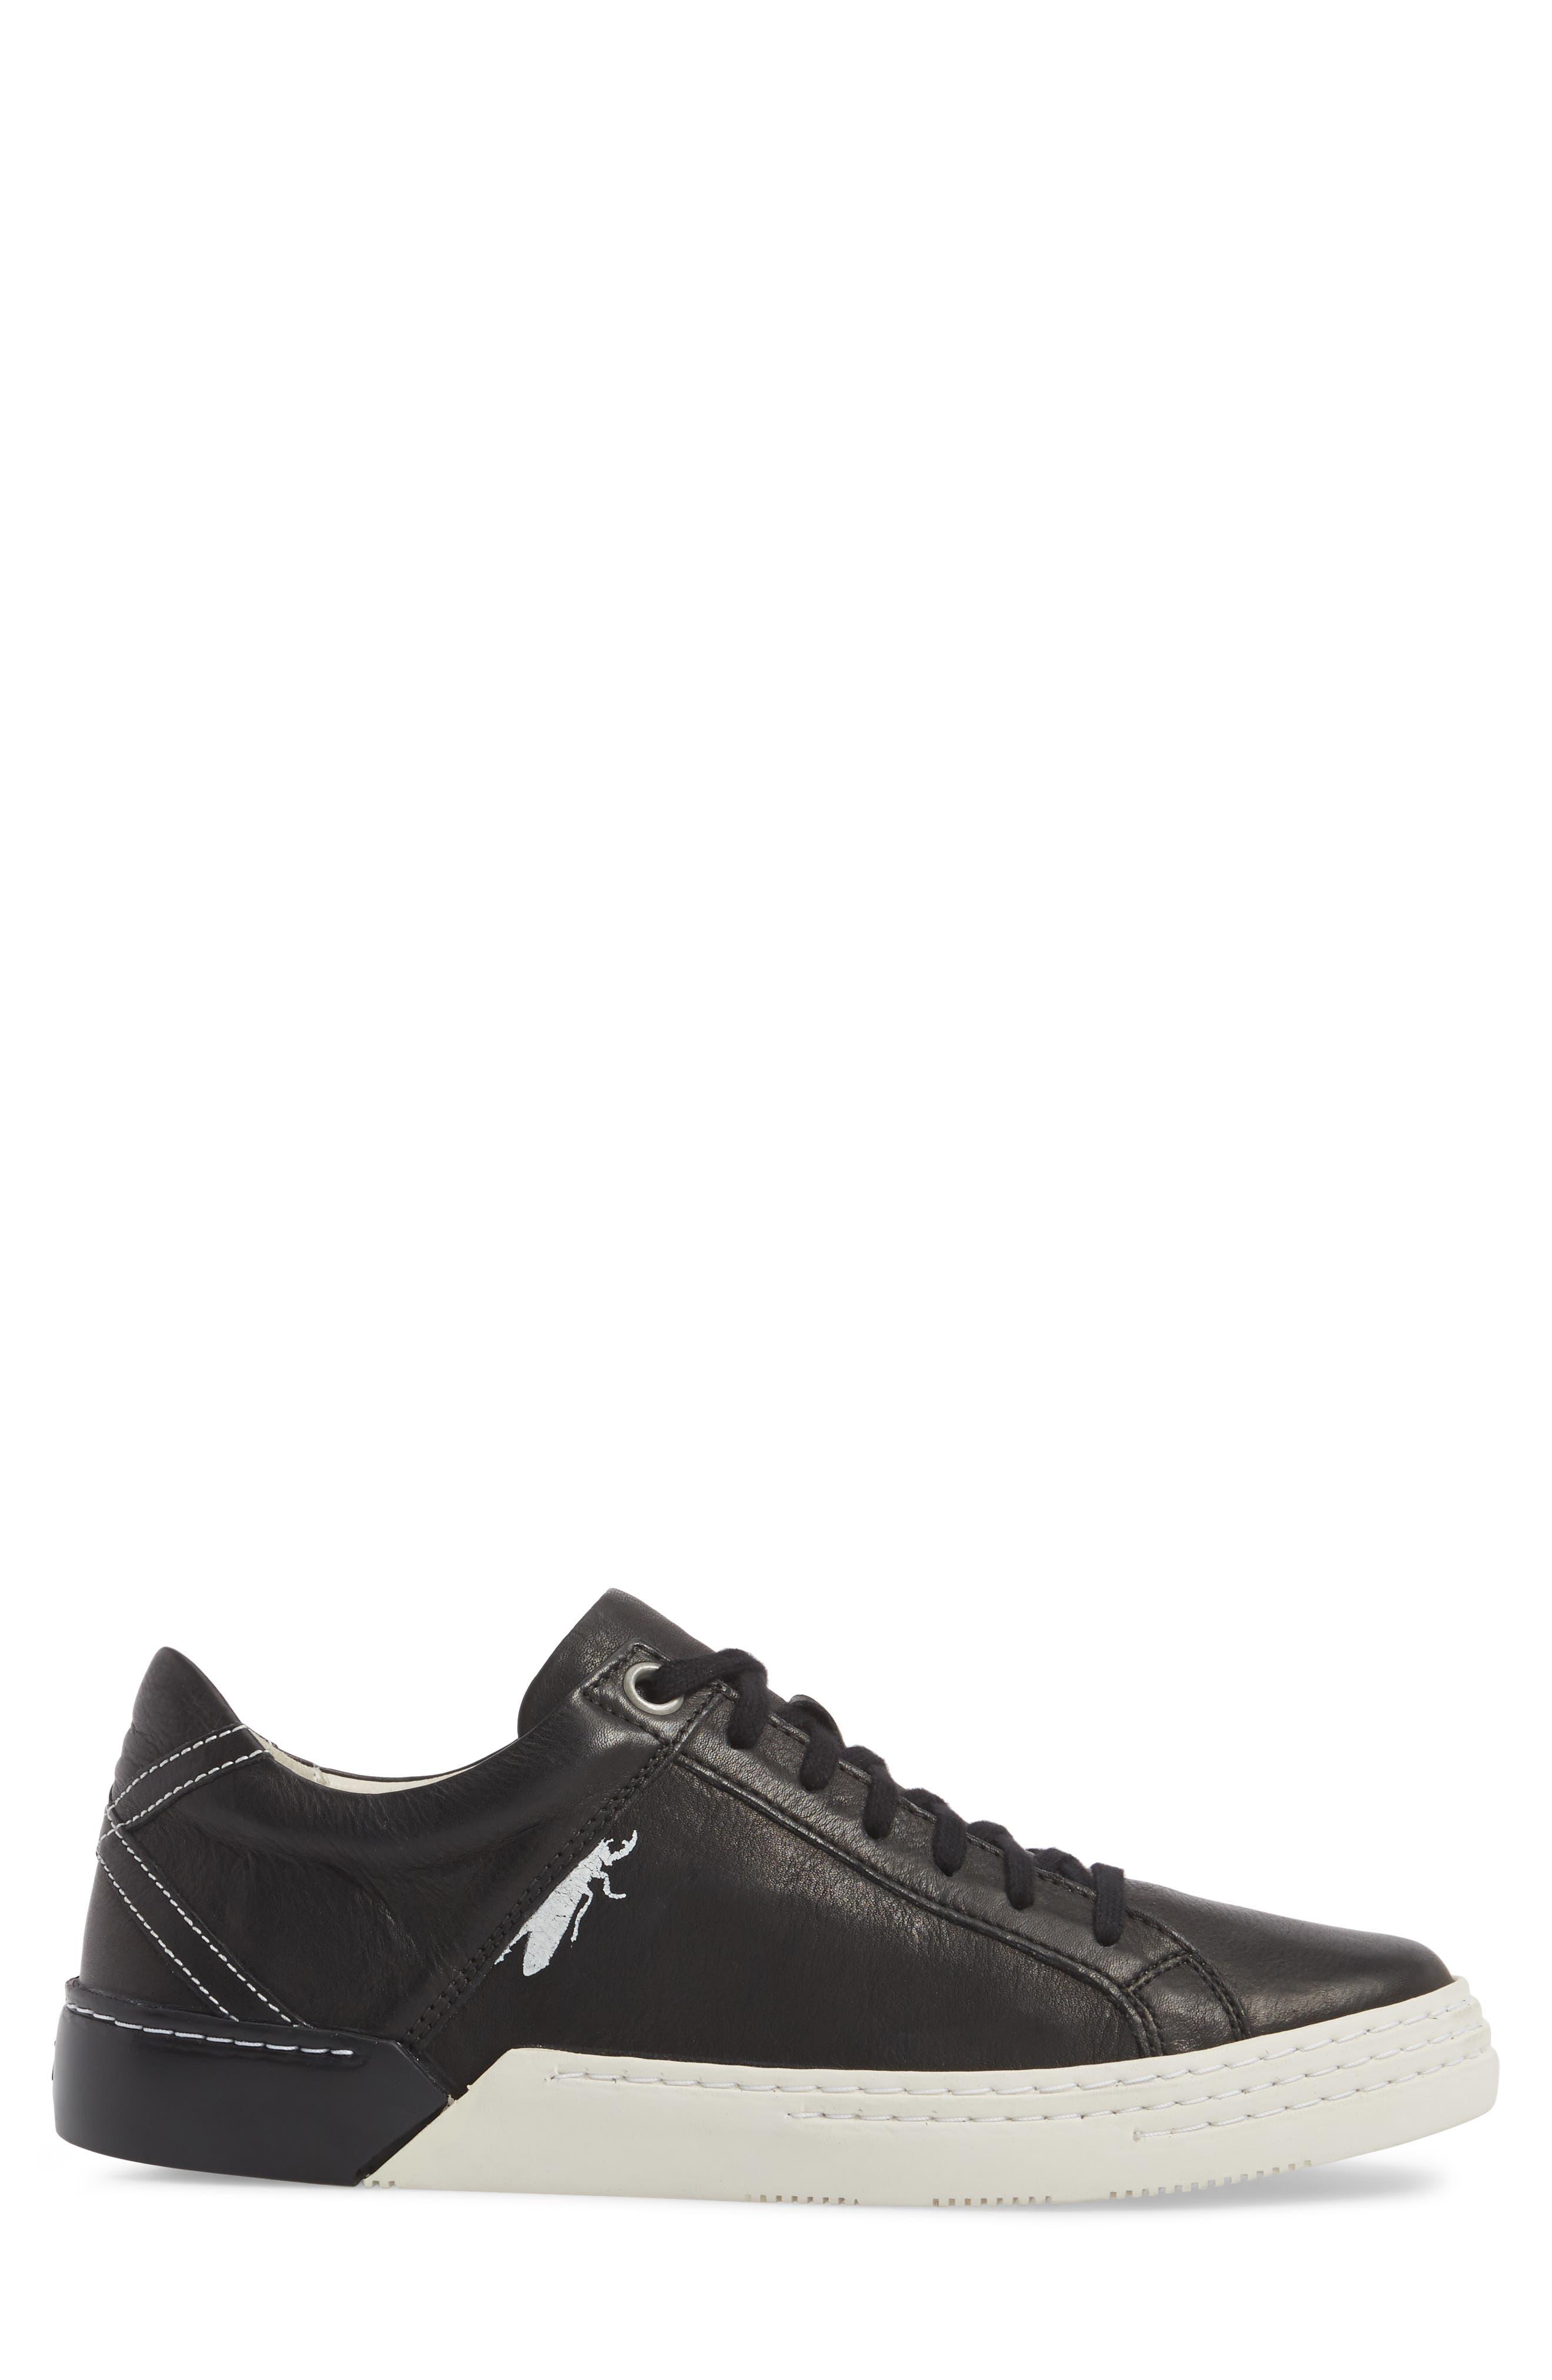 Sene Low Top Sneaker,                             Alternate thumbnail 3, color,                             BLACK LEATHER